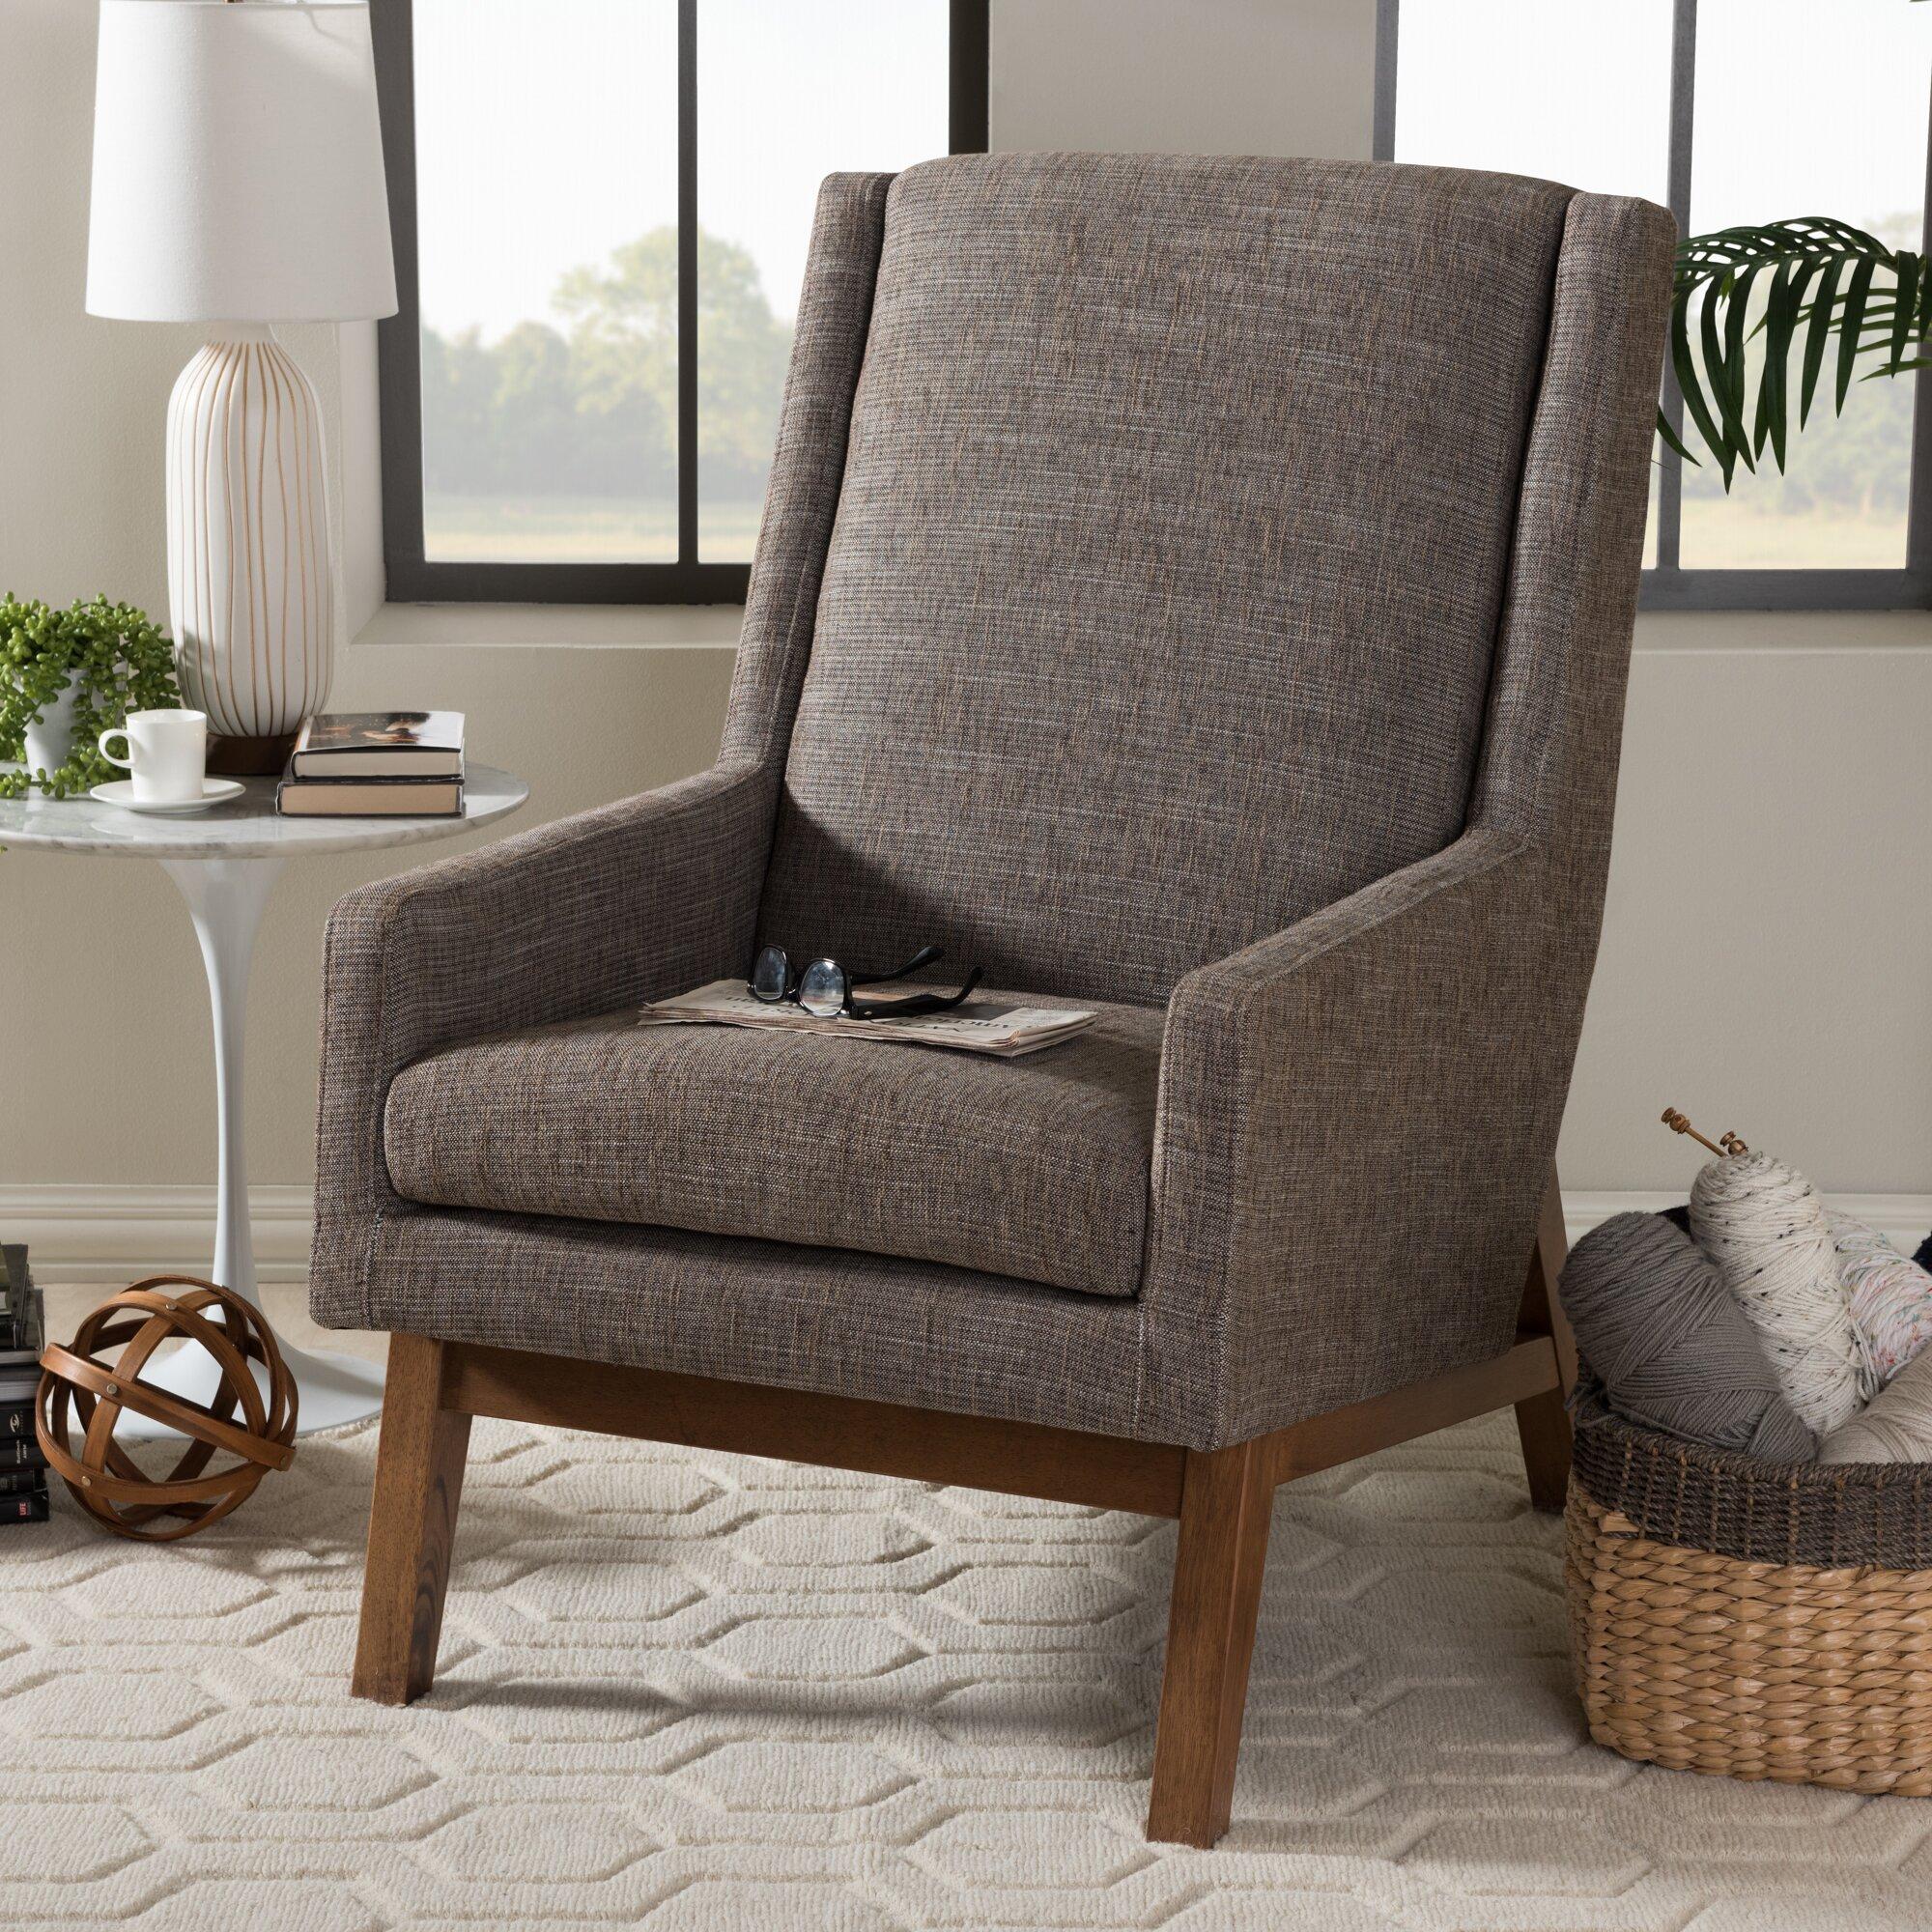 wholesale interiors baxton studio gerardo upholstered lounge chair baxton studio lounge chair